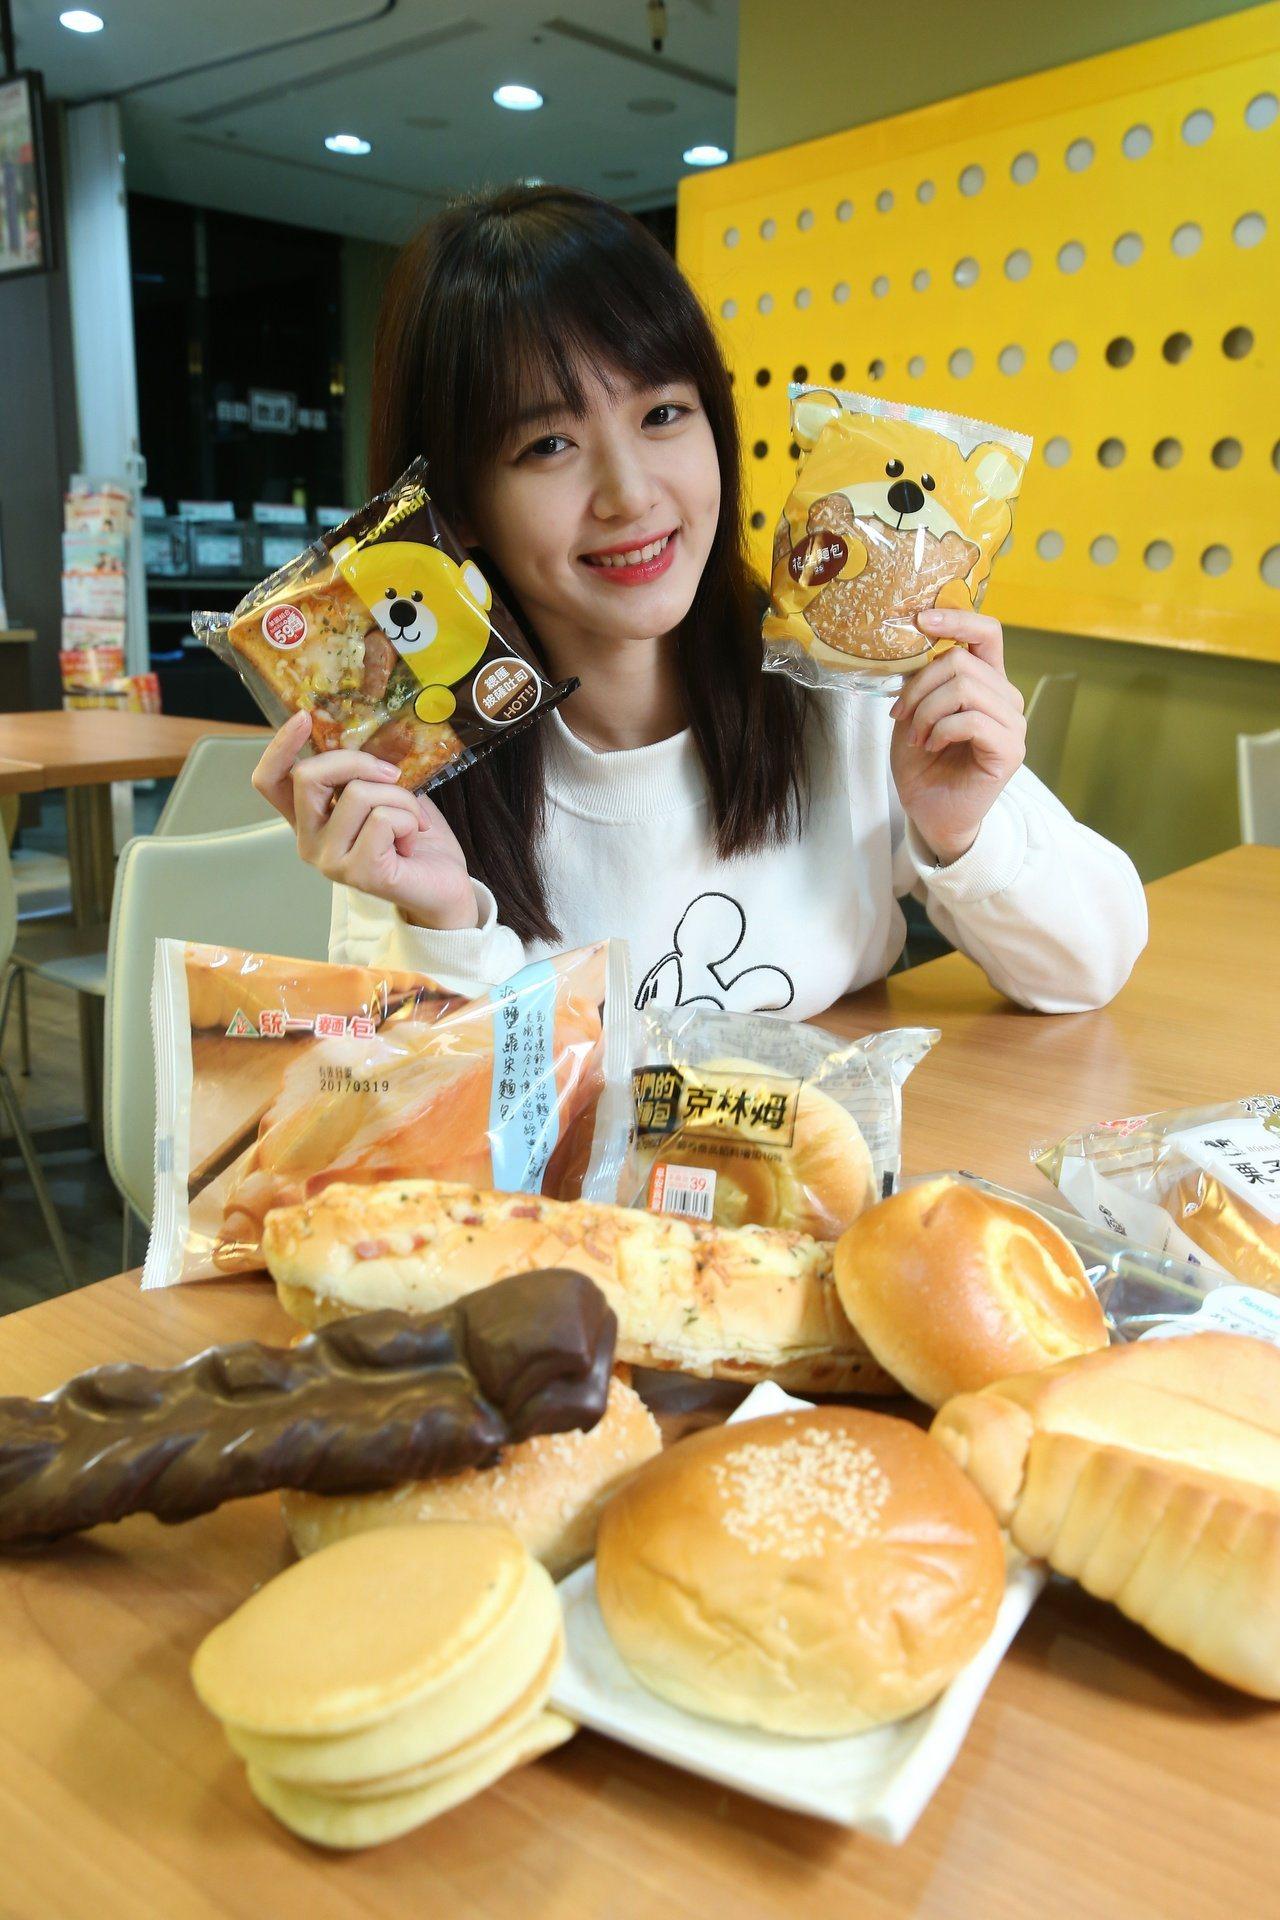 PTT網友推薦最強超商麵包,引來熱烈討論。記者陳立凱/攝影